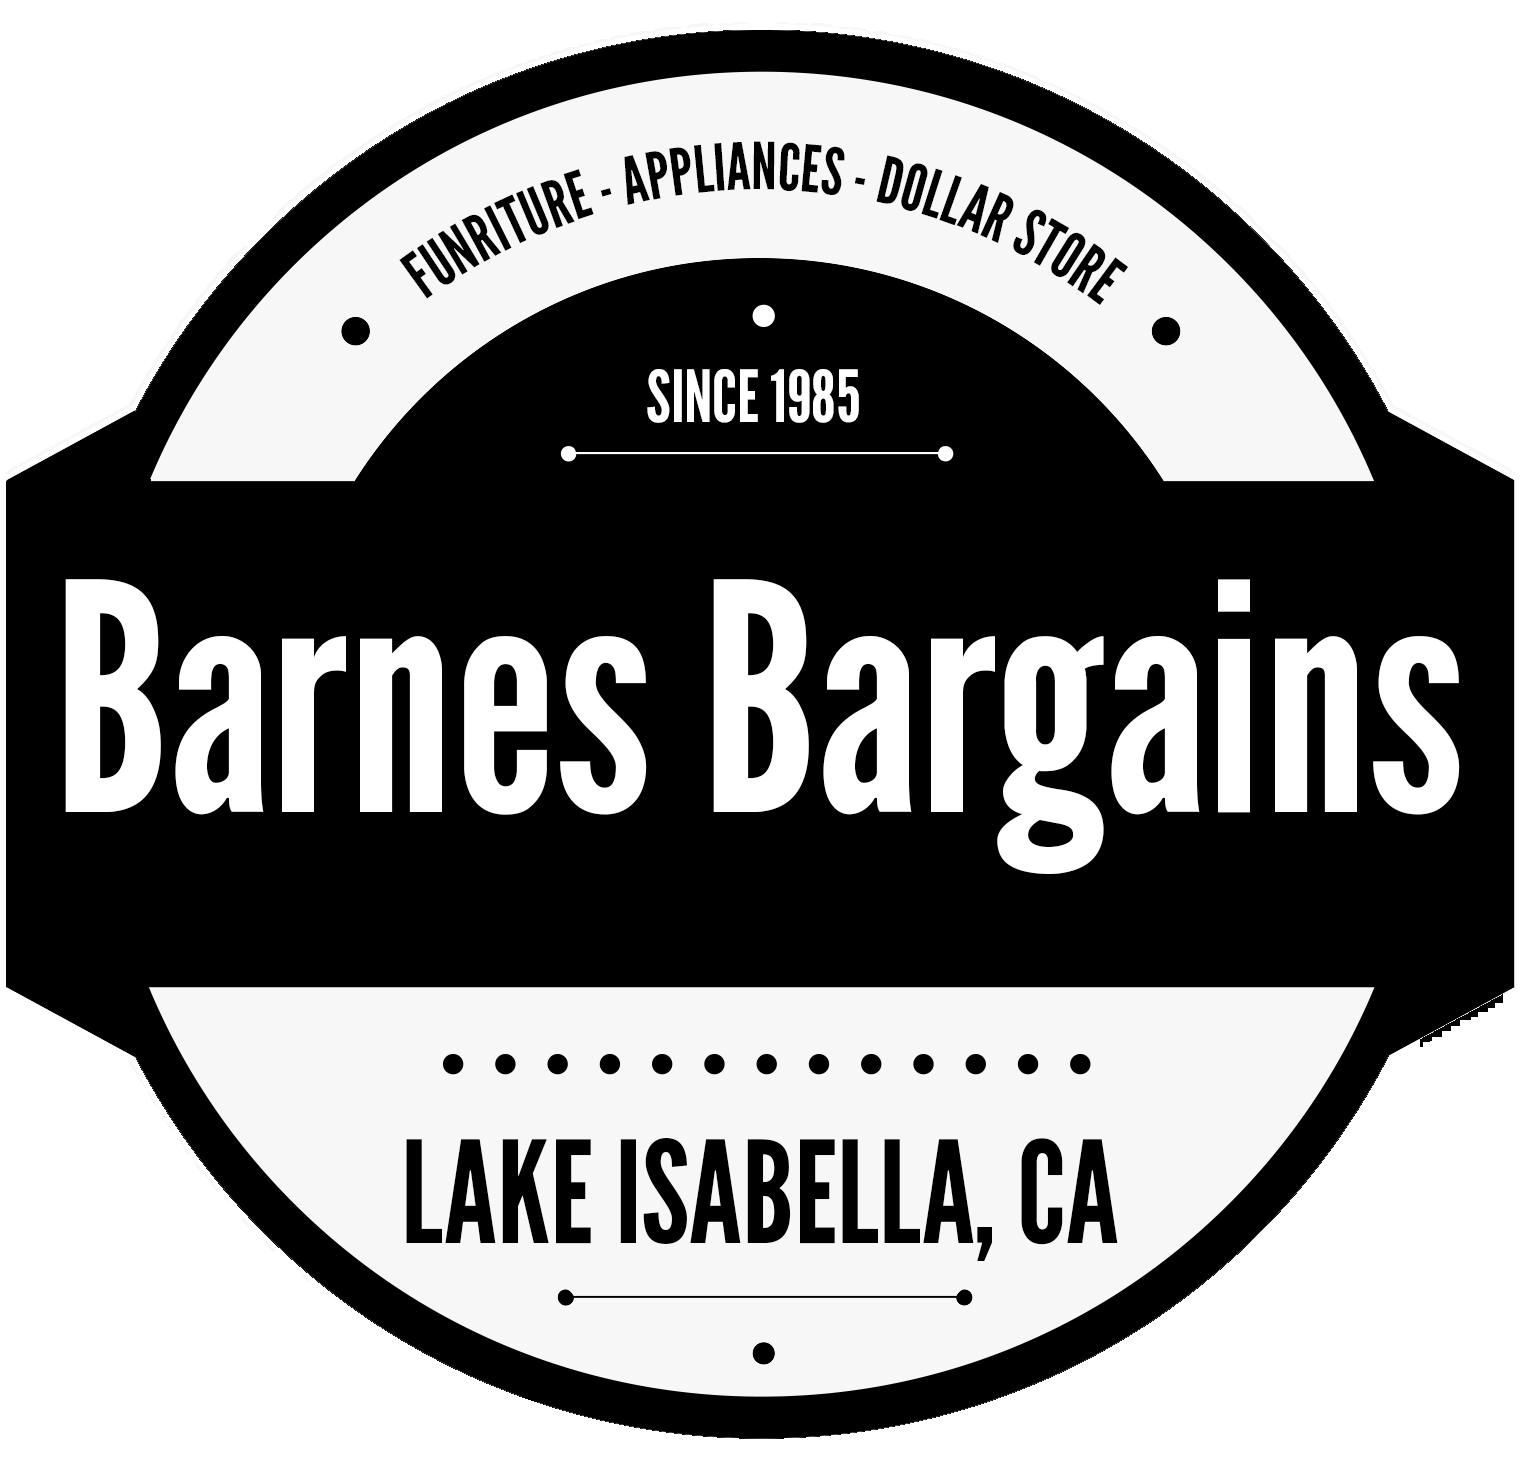 Barnes Bargains